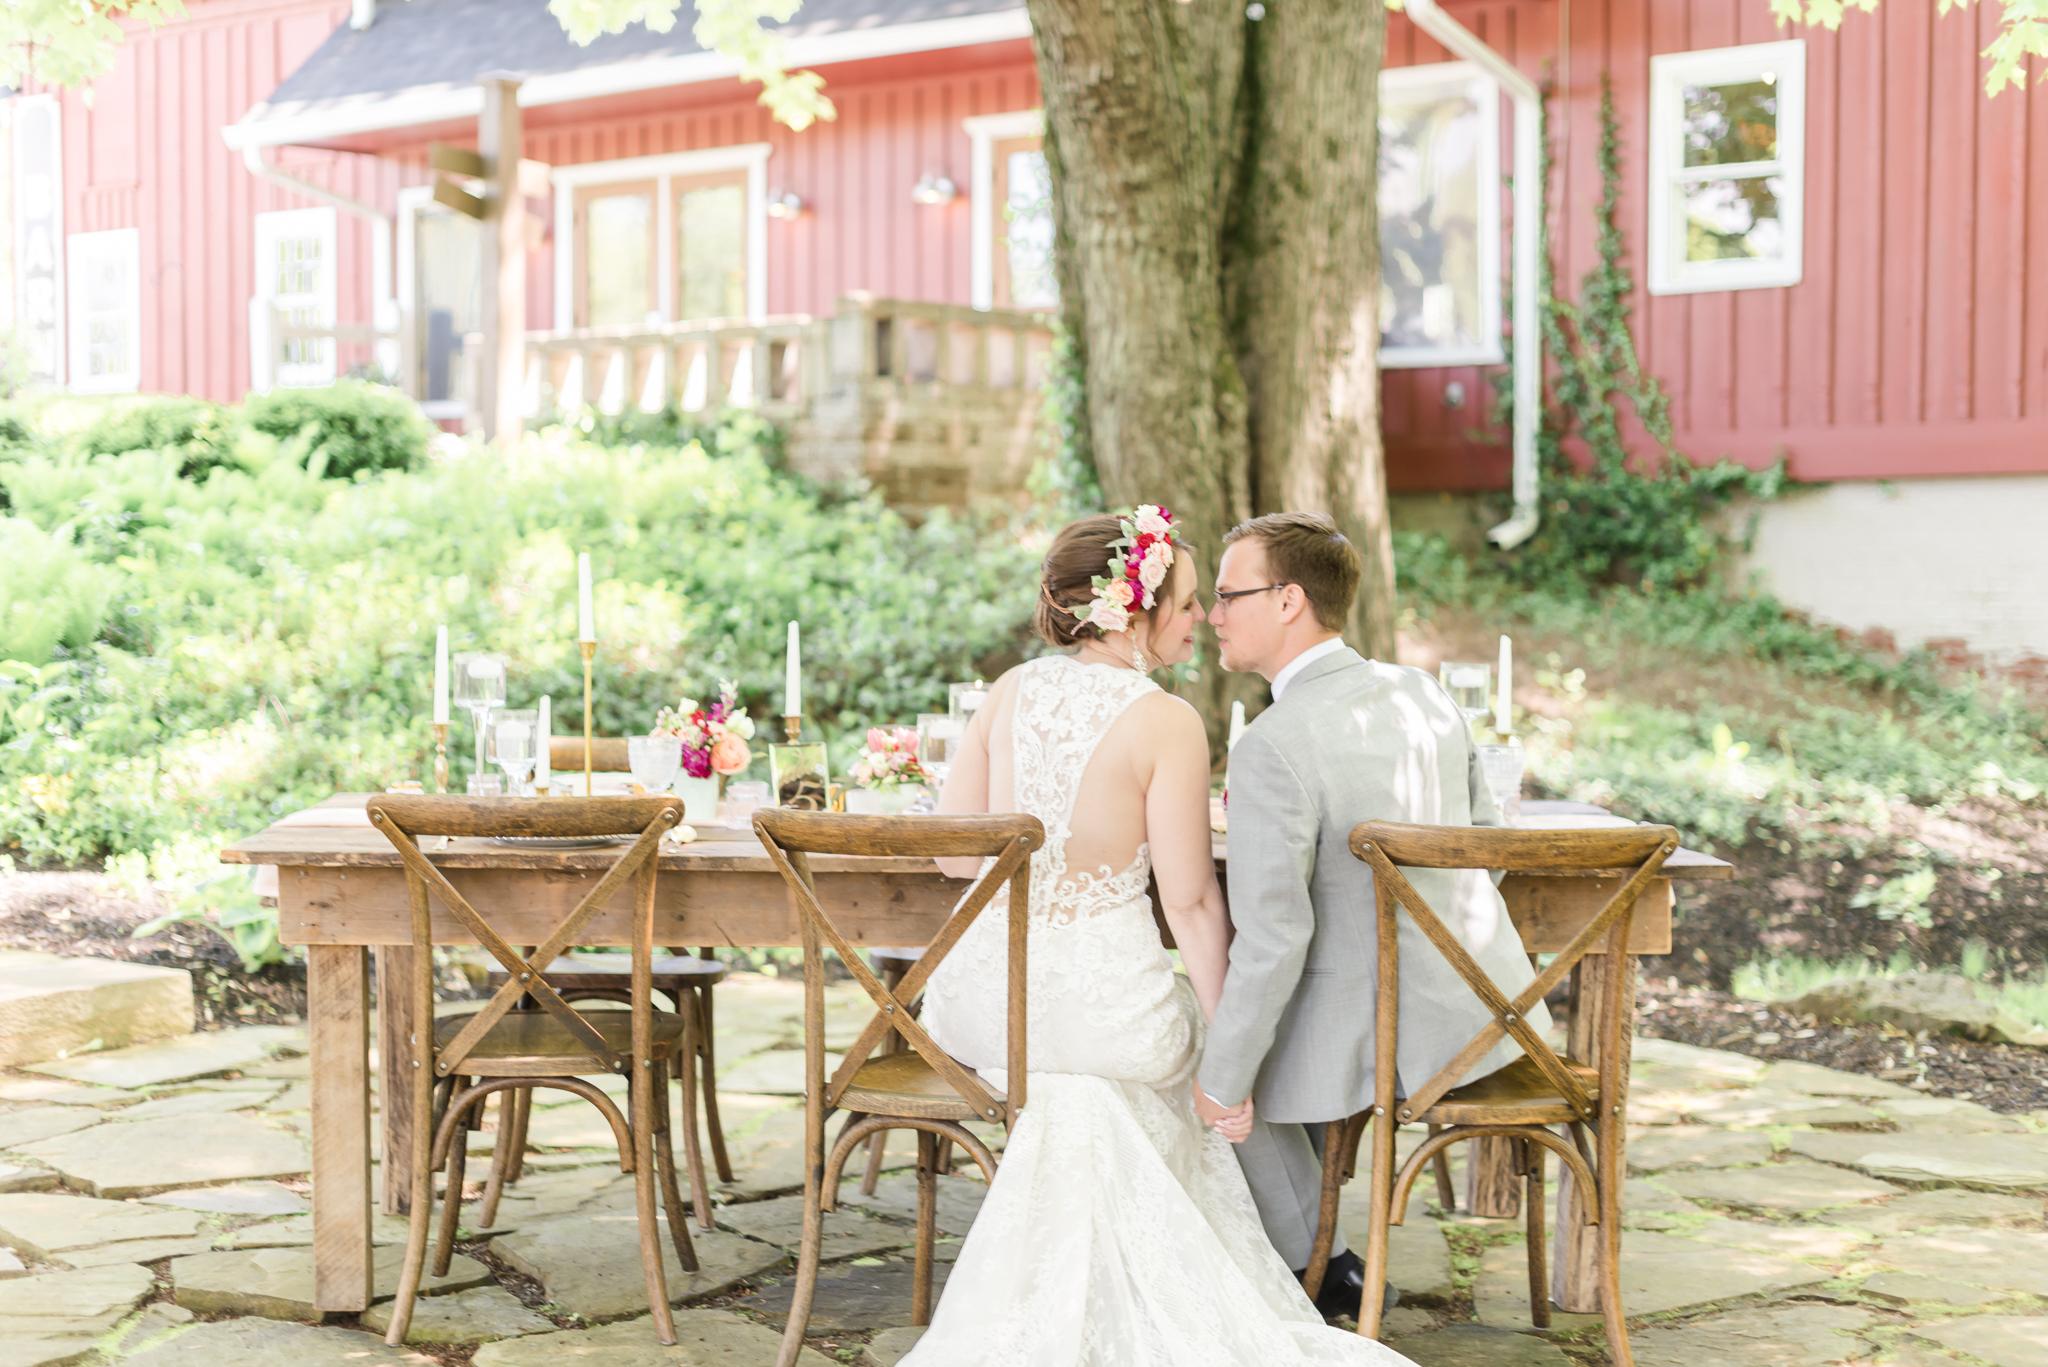 Mustard Seed Gardens Wedding Indianapolis Noblesvile Fishers Wedding Photographer-67.jpg